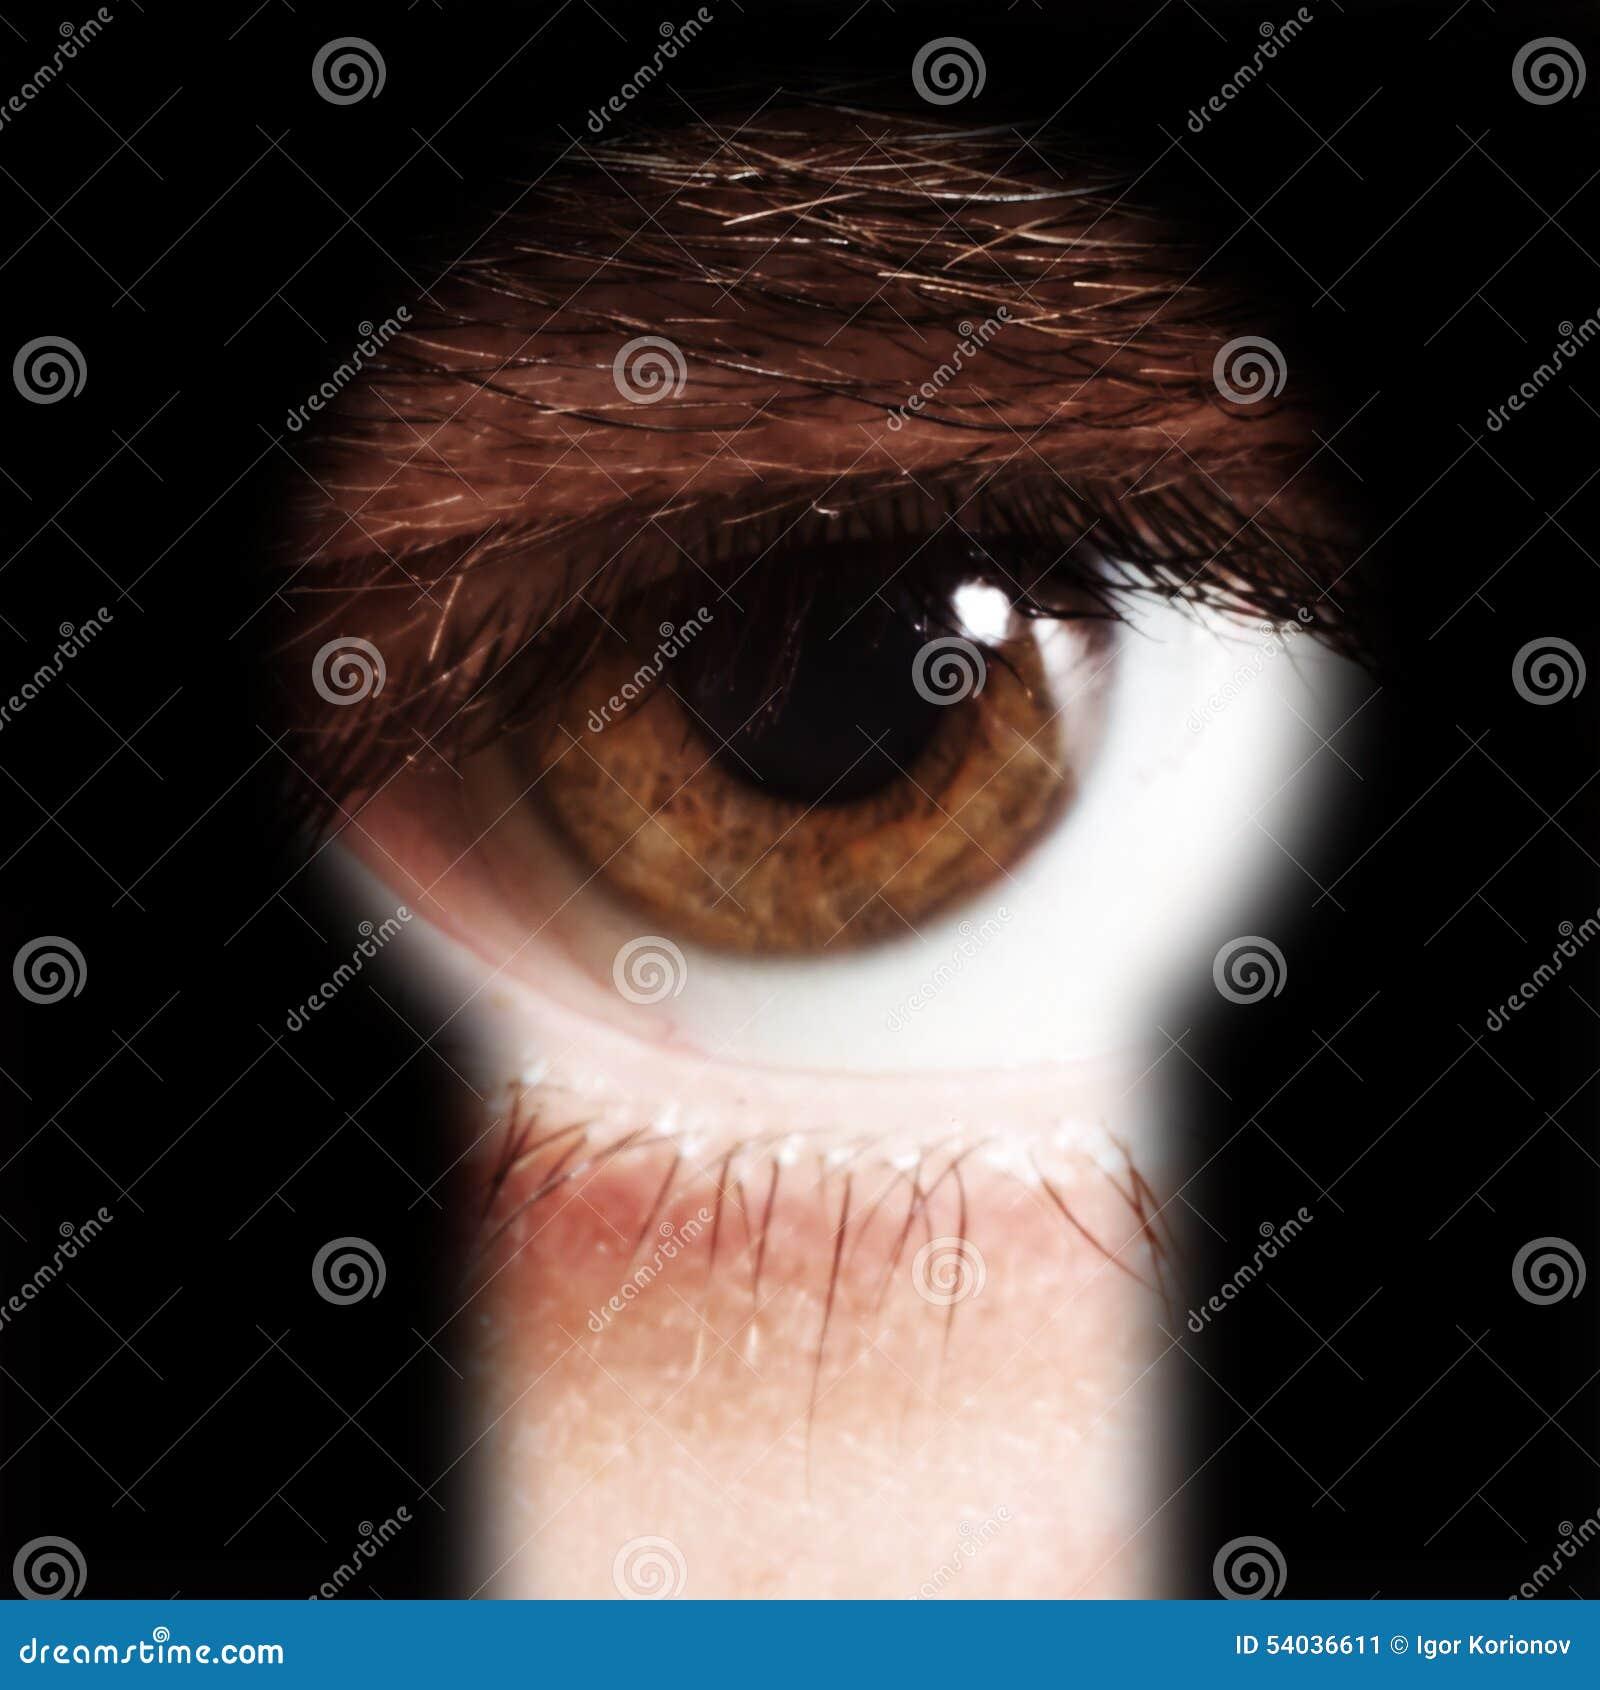 Oeil masculin remarquant par un trou de la serrure